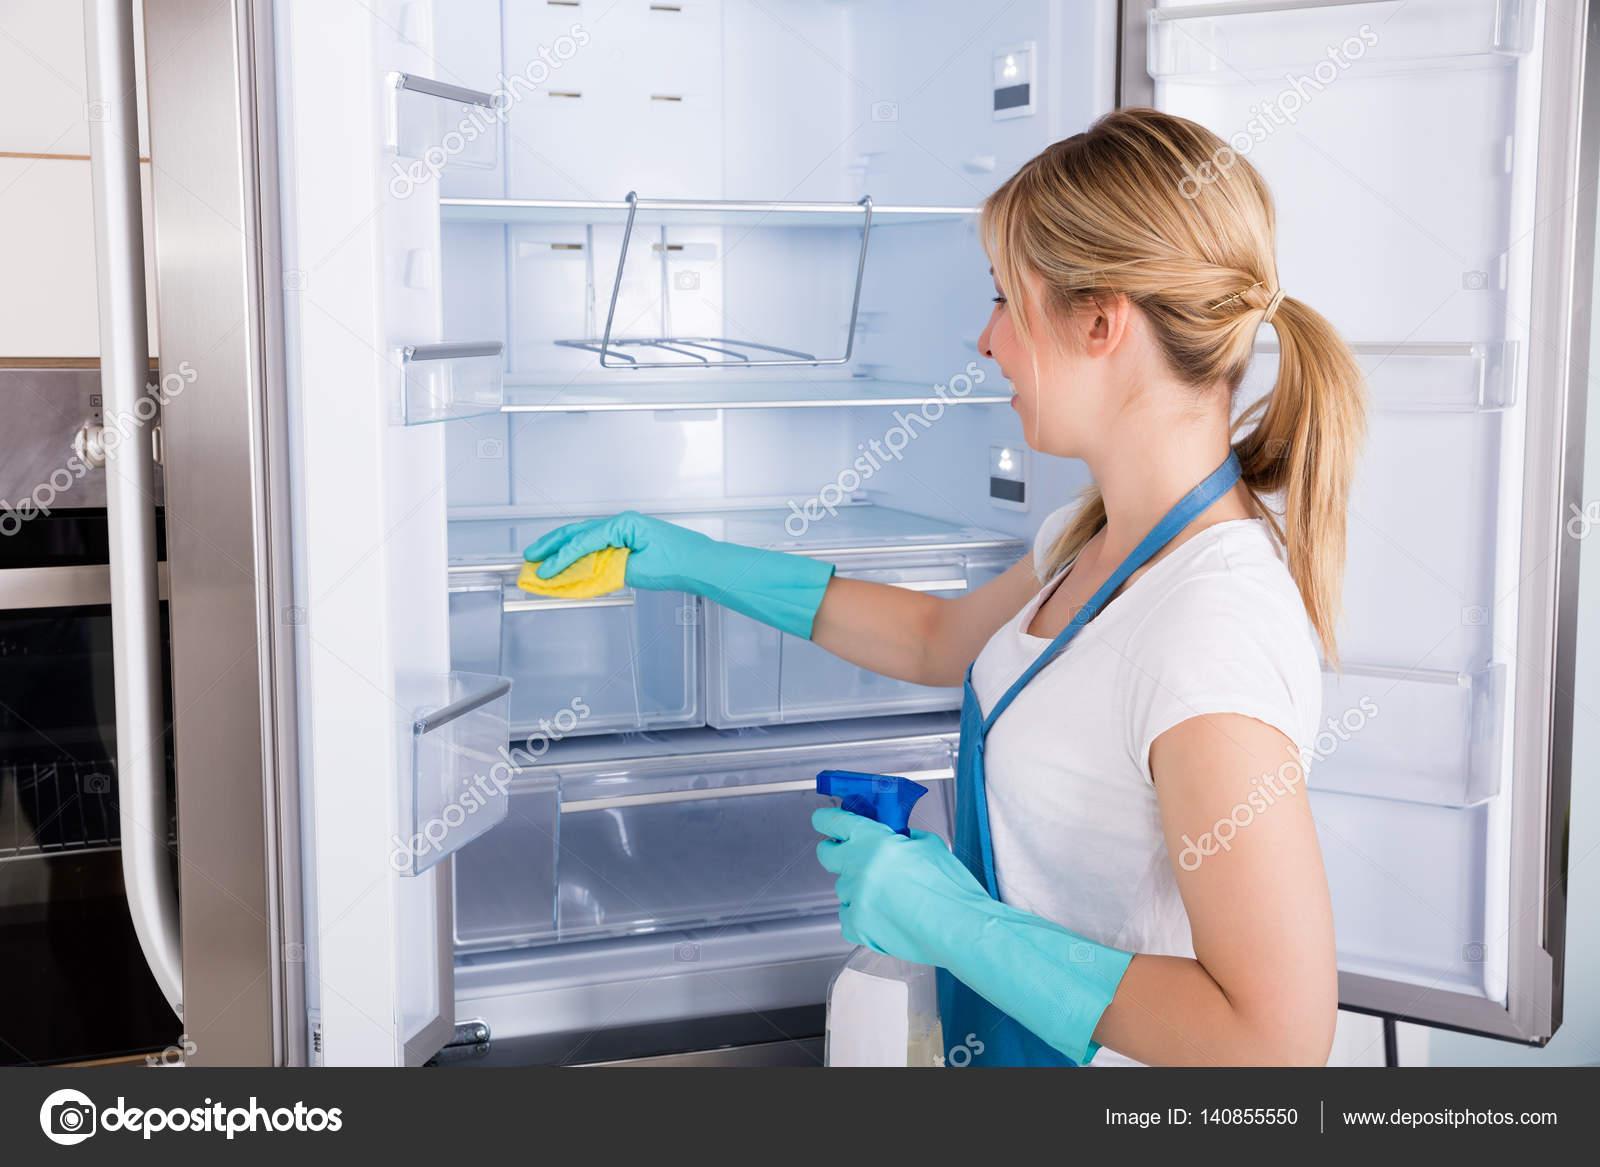 Kühlschrank Reinigen : Frau reinigung kühlschrank u2014 stockfoto © andreypopov #140855550